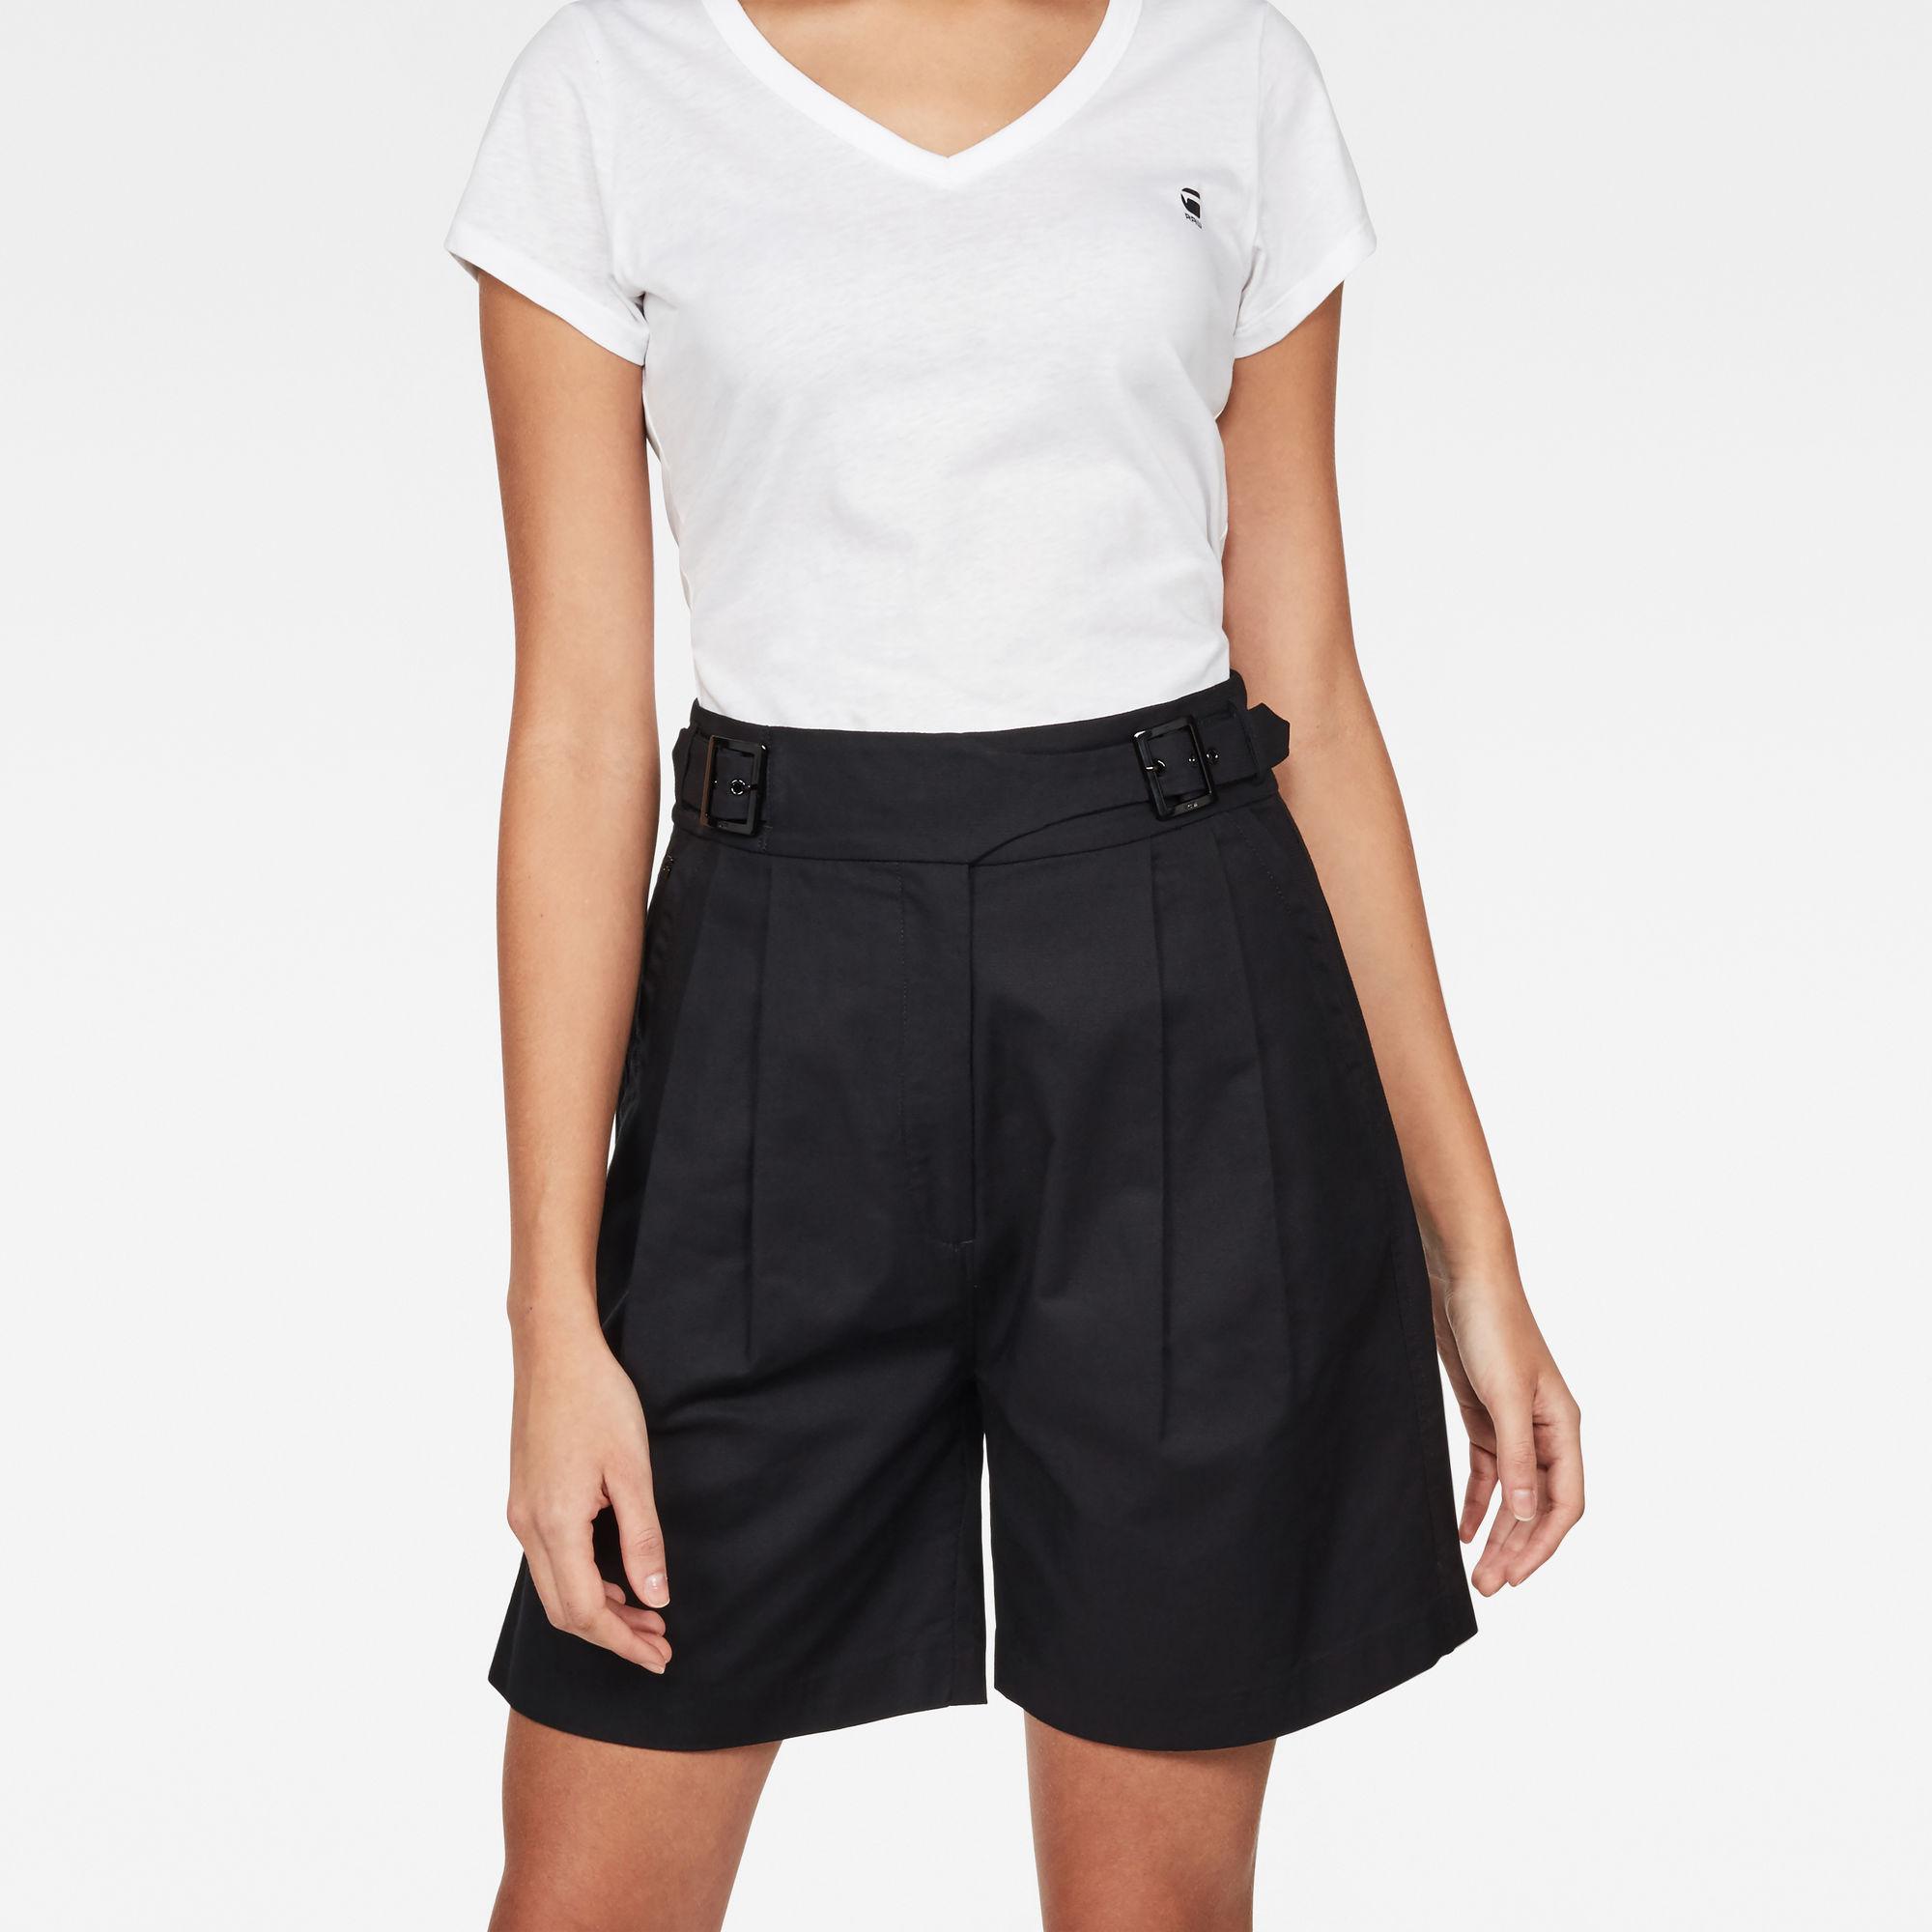 Bristum Pleated High waist Bermuda Shorts